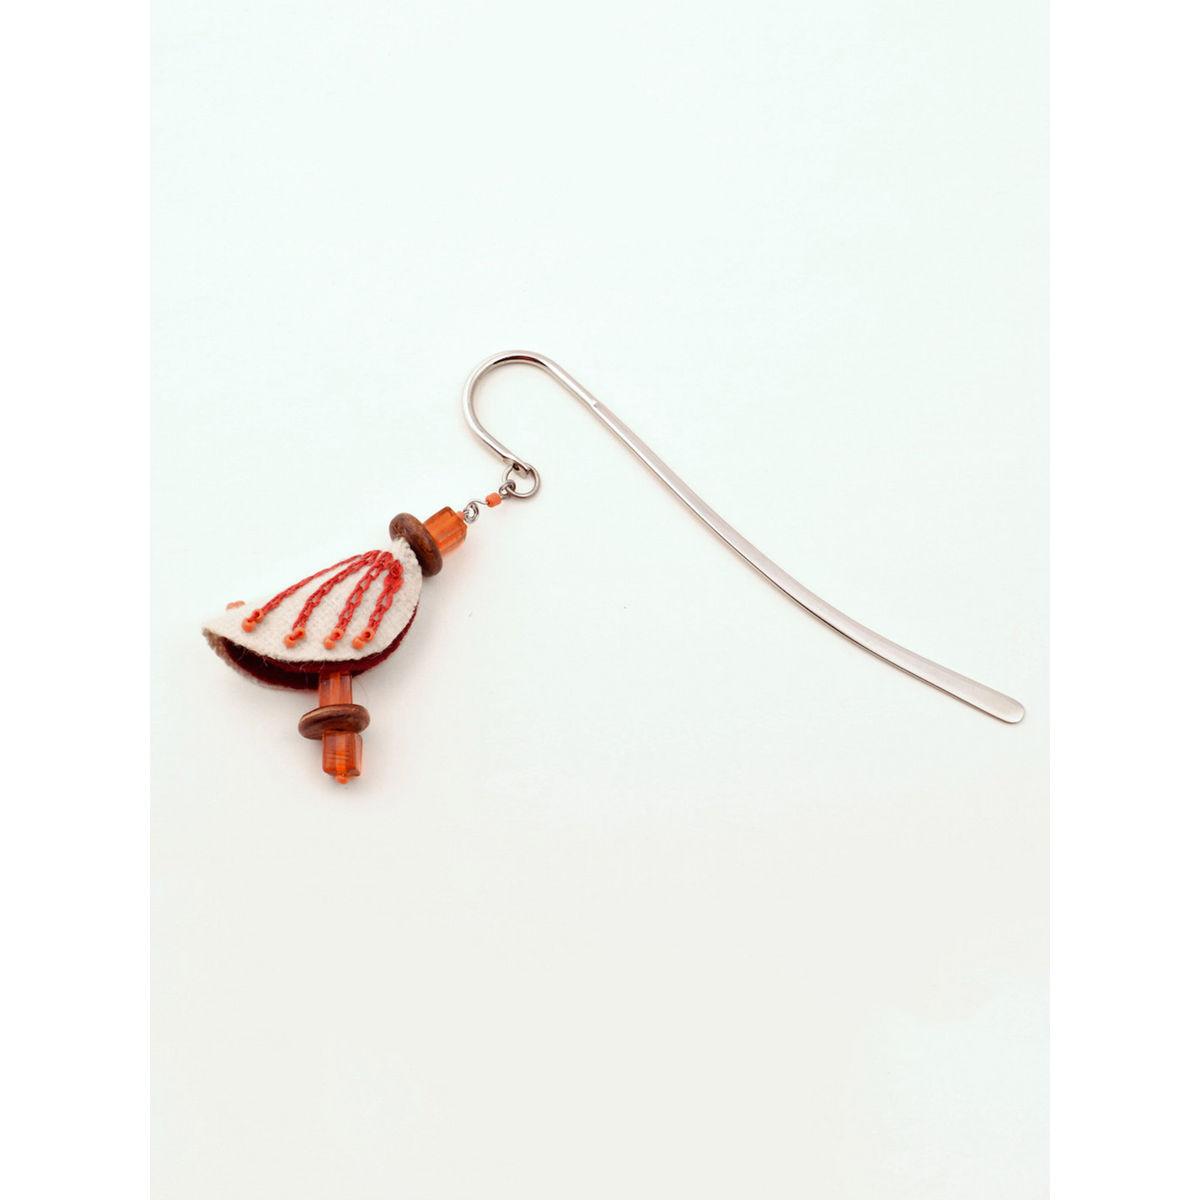 Chrysalis Bookmark - Orange